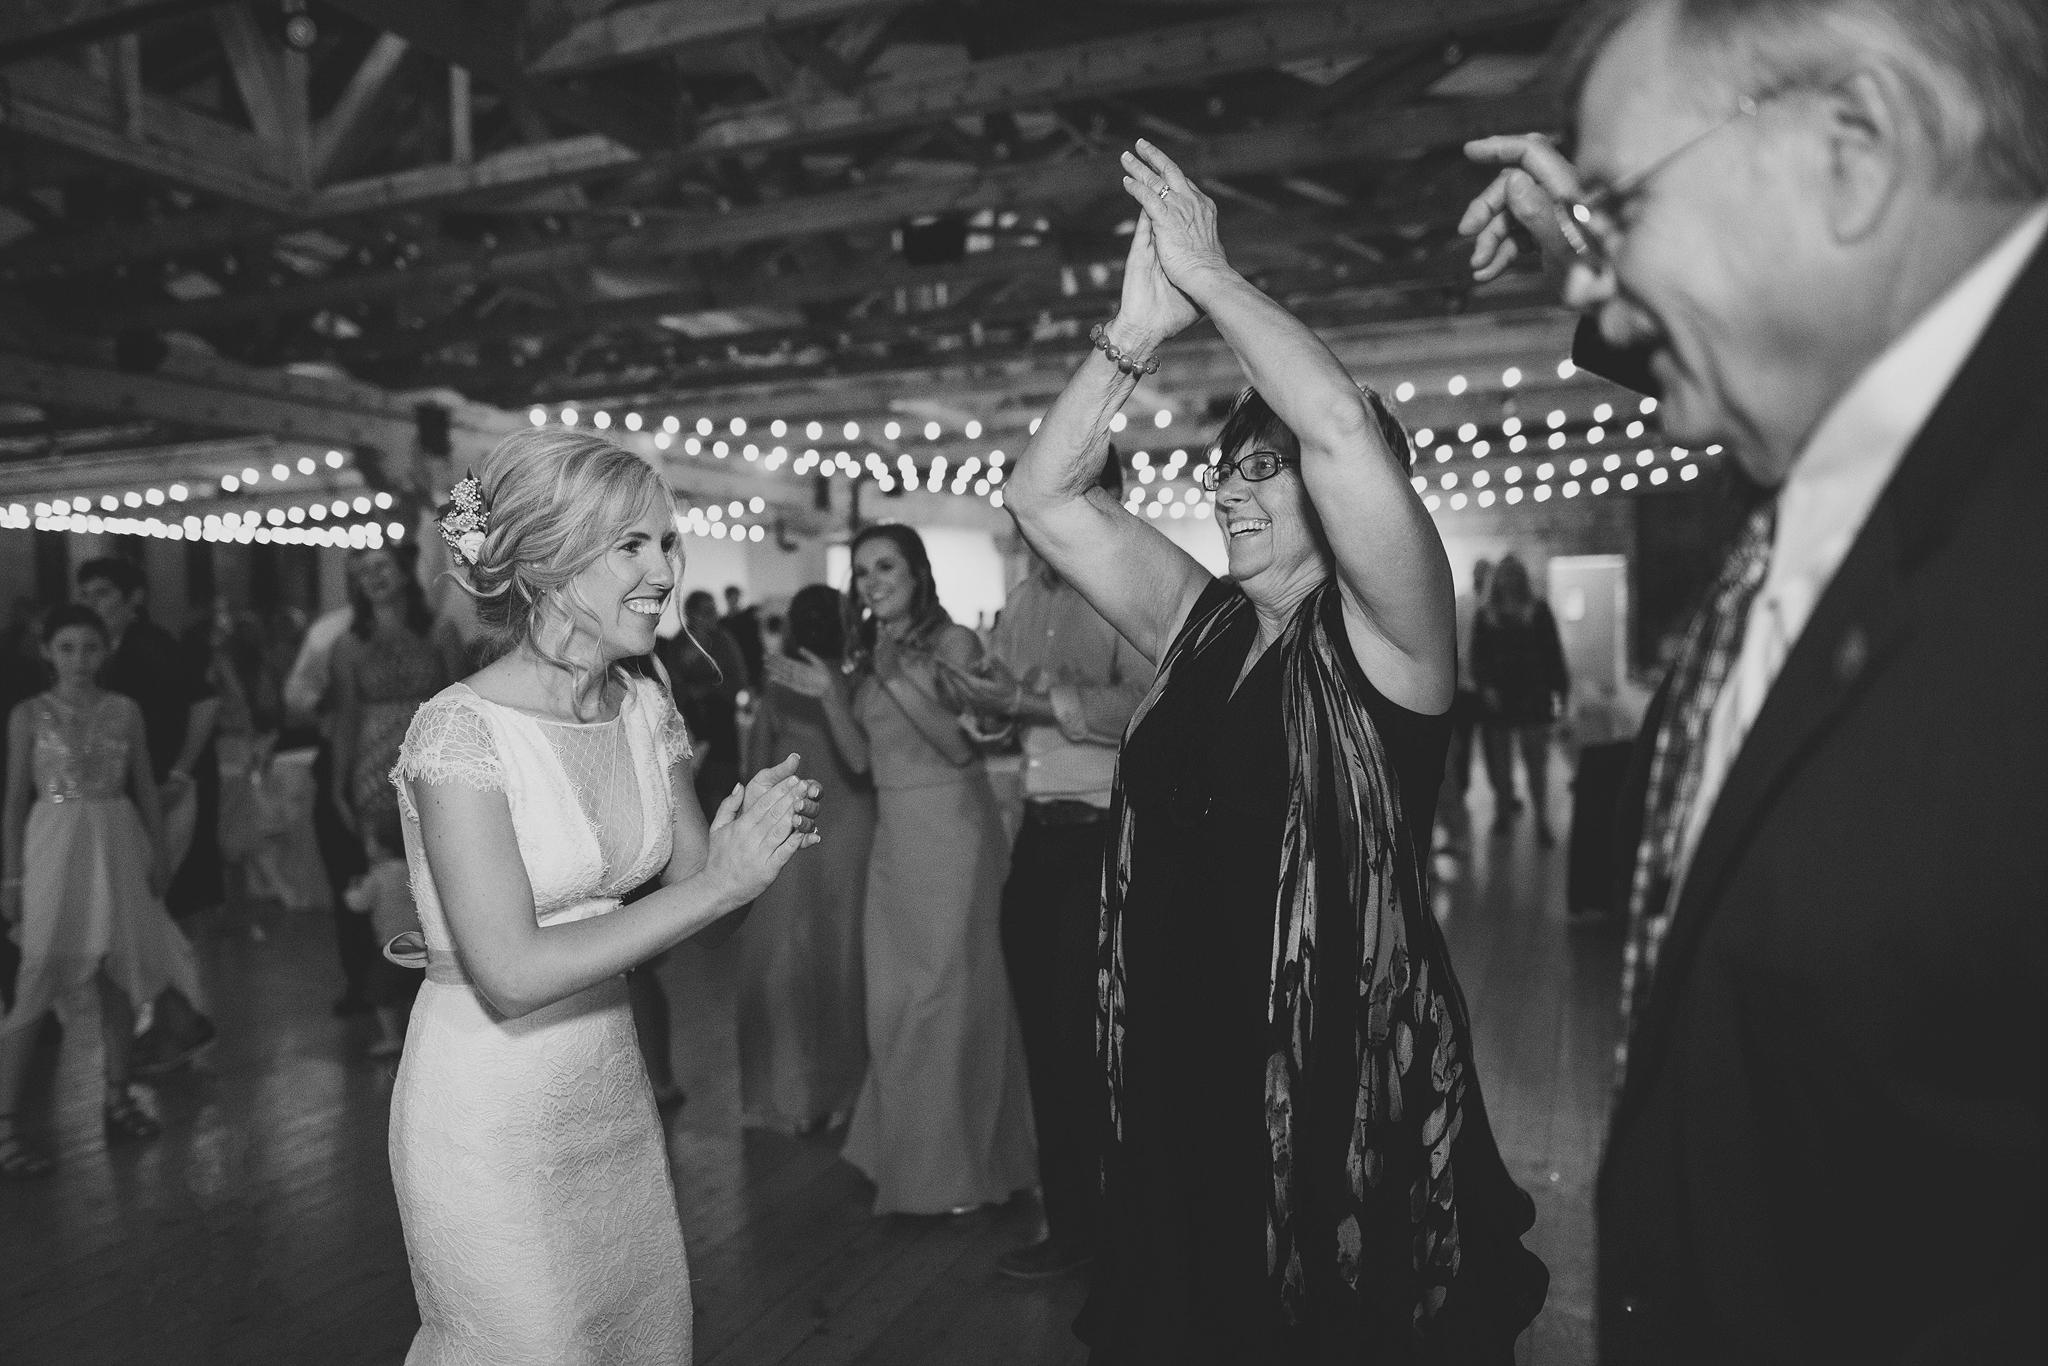 Cincinnati-Dayton-OH-Traveling-Wedding-Photographer-Rhinegeist-Brewery-Ault-Park-21C-172.jpg